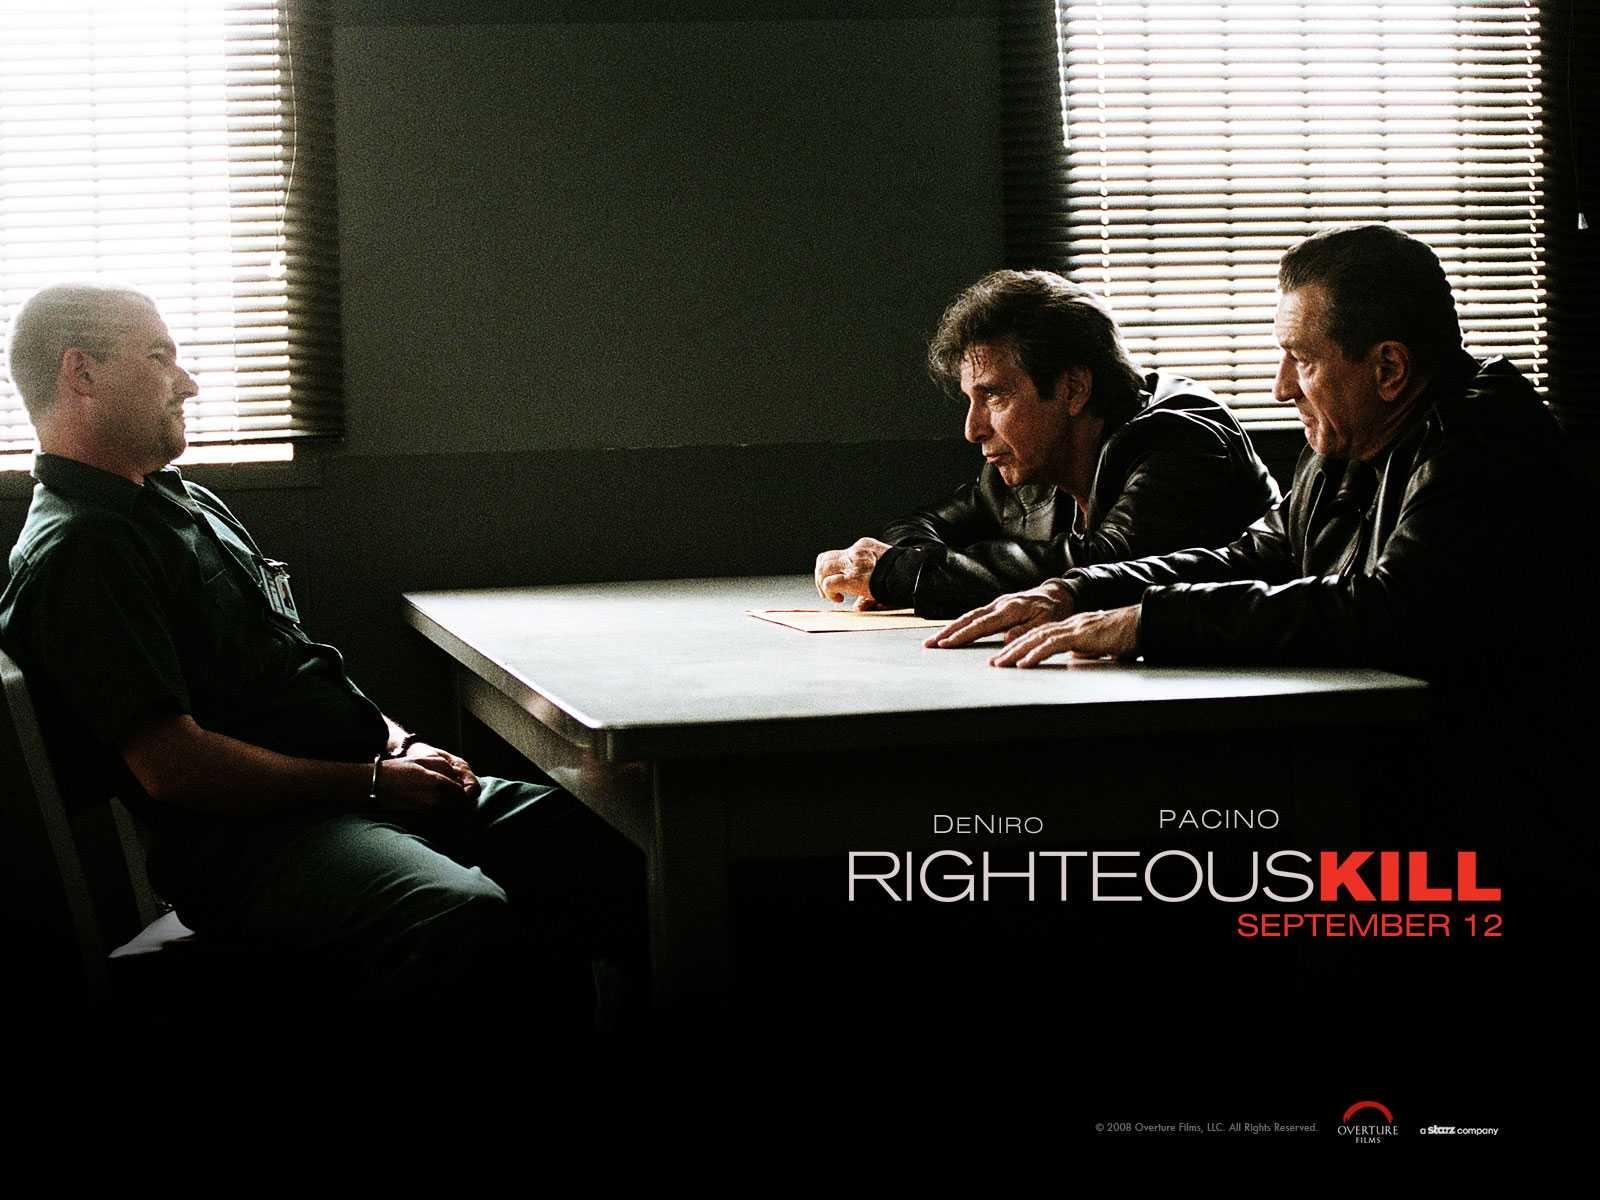 Un wallpaper del film Sfida senza regole - Righteous Kill con Al Pacino e Robert De Niro